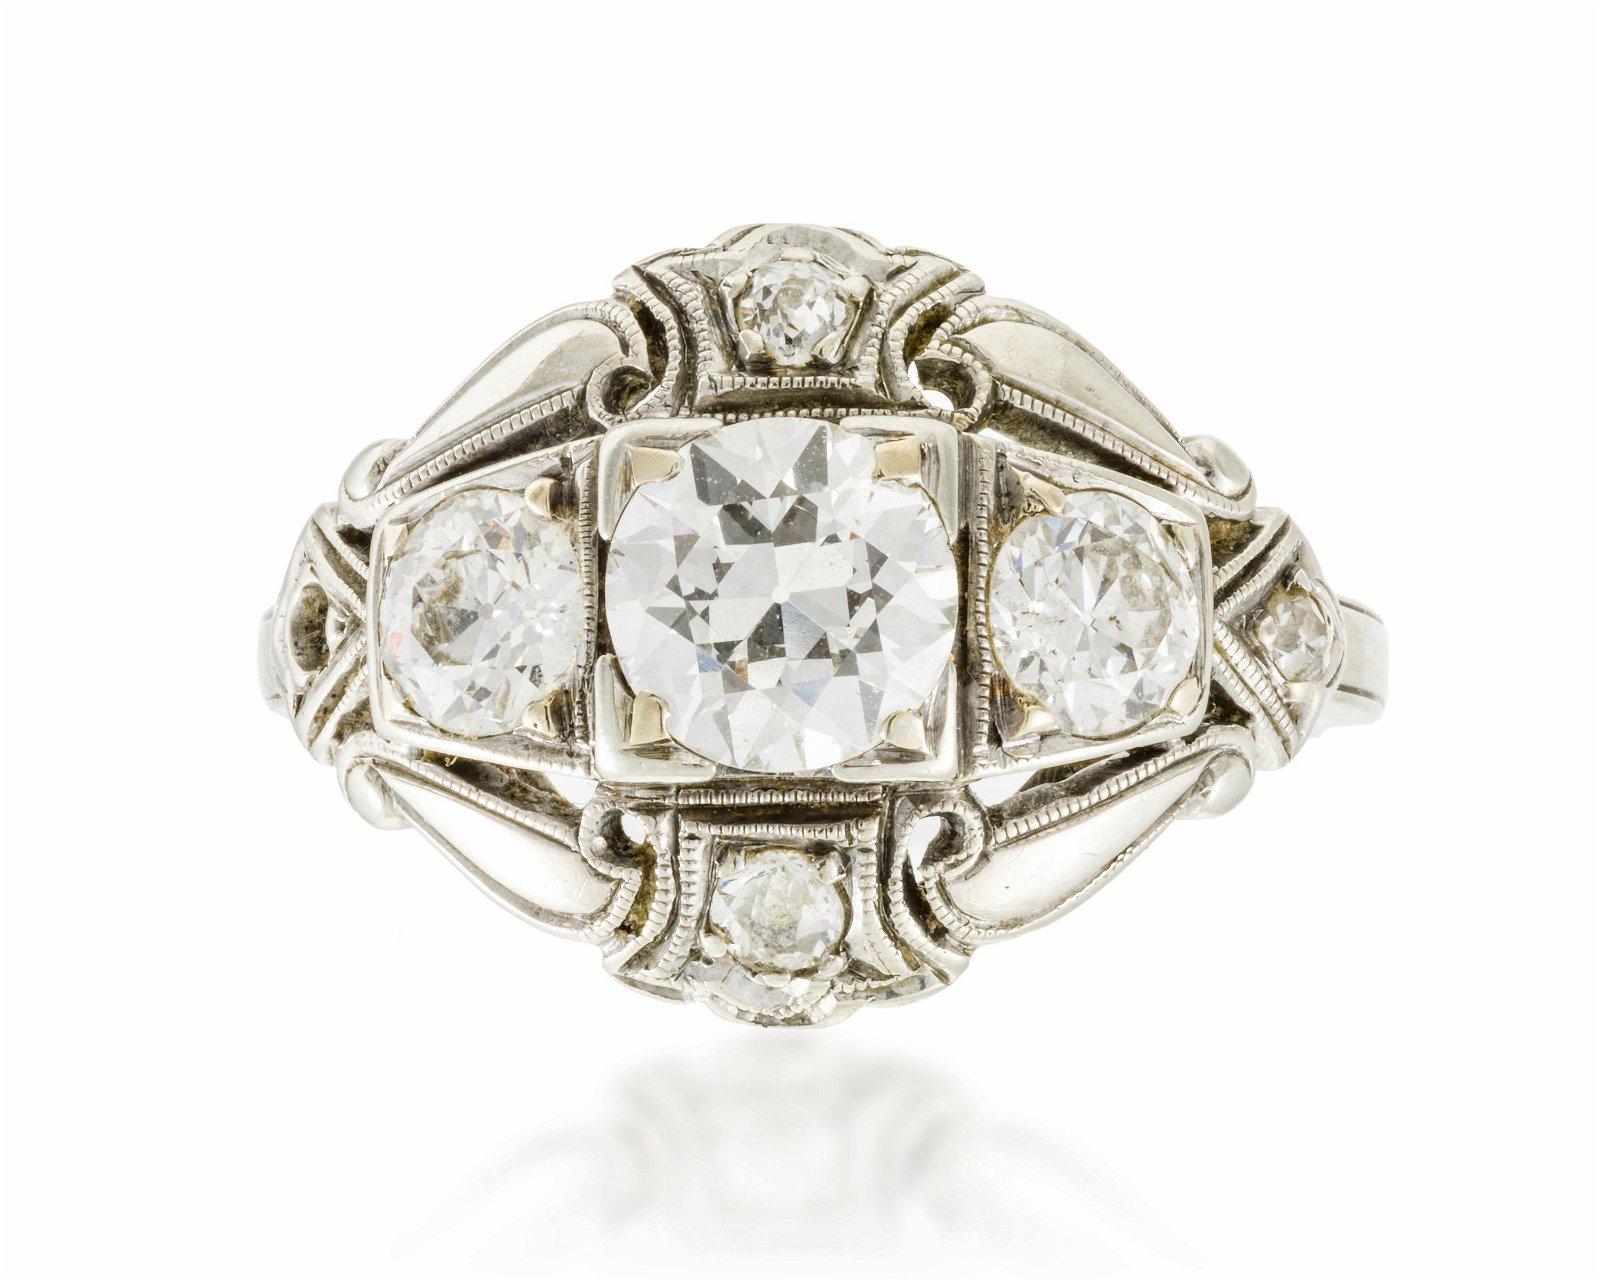 A late Art Deco diamond ring